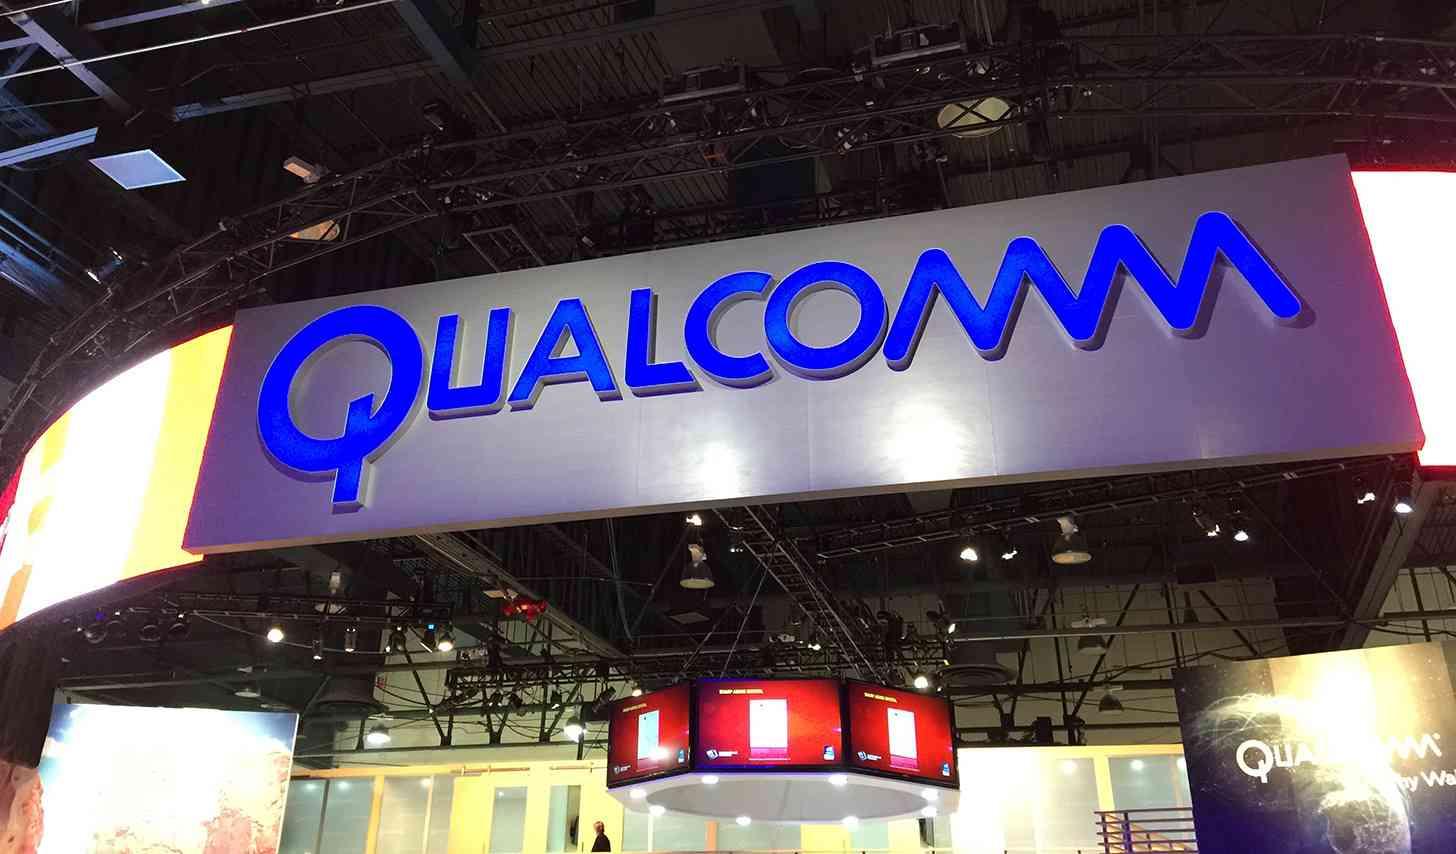 Qualcomm CES 2015 booth